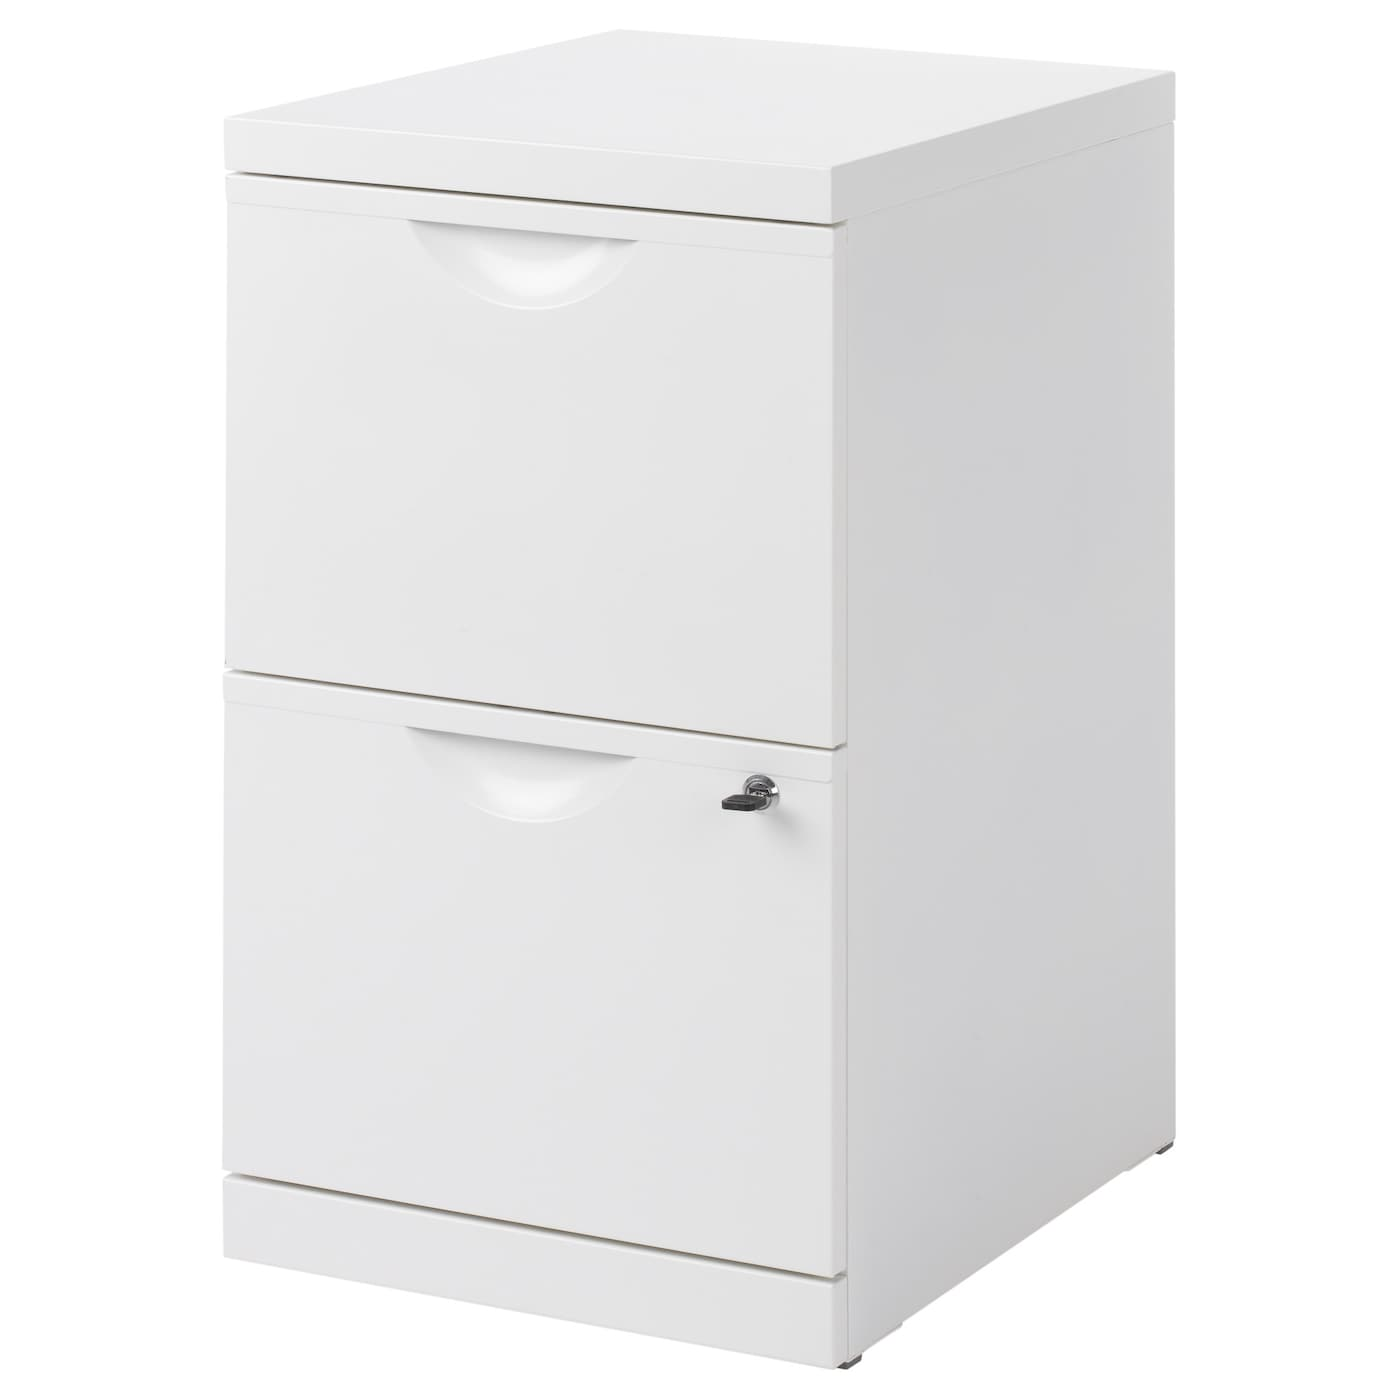 IKEA Filing Cabinets | Ireland - Dublin